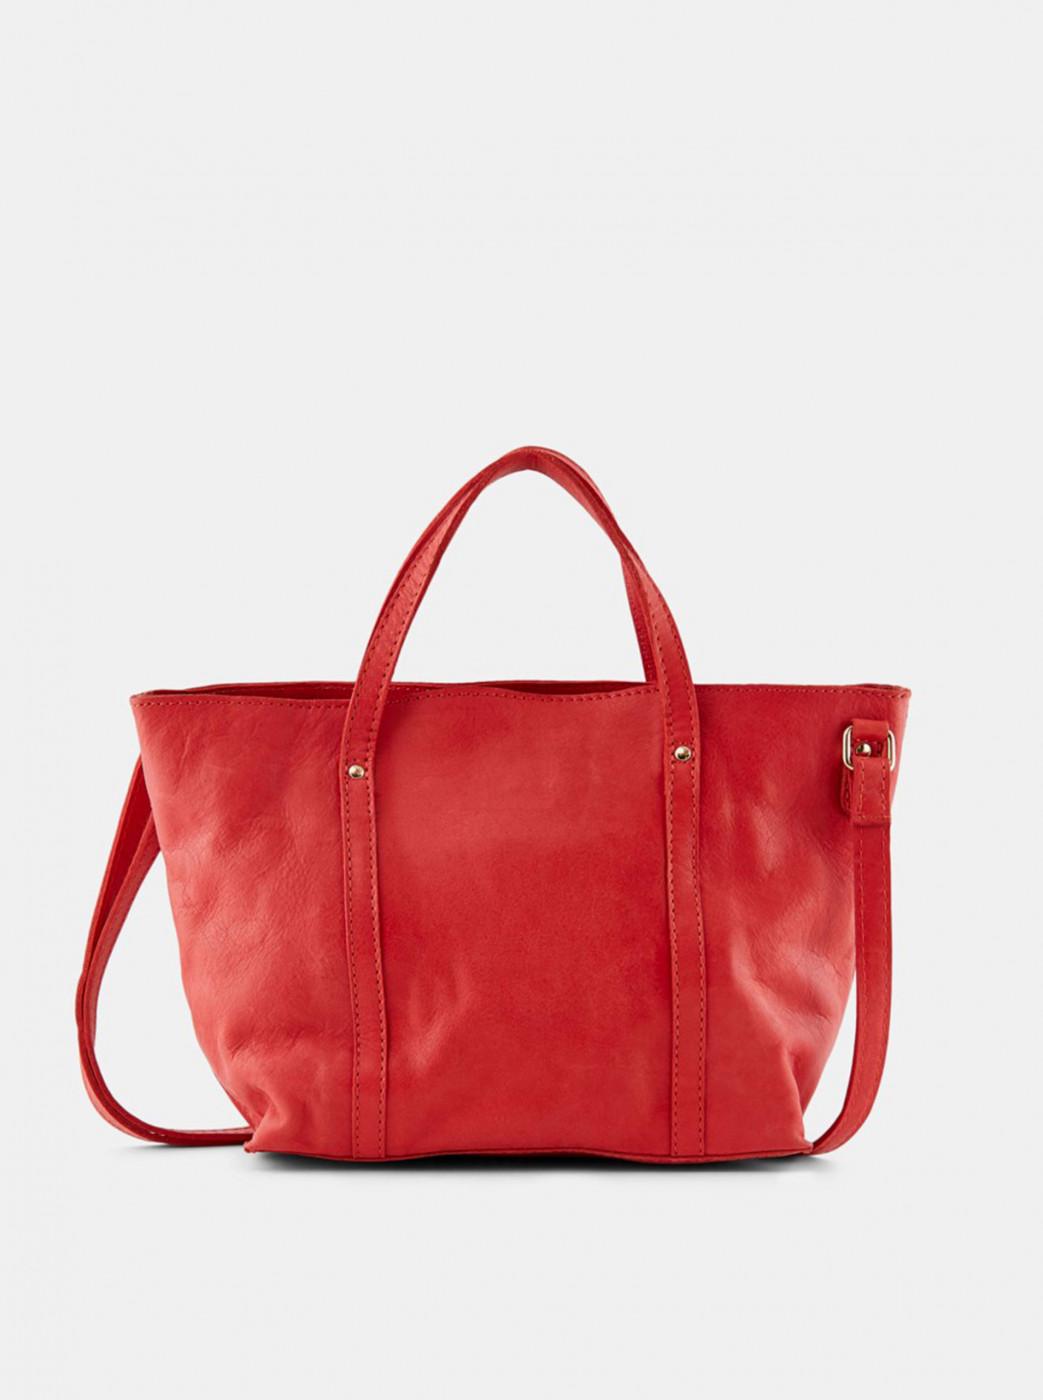 Pieces Aida Red Small Leather Handbag